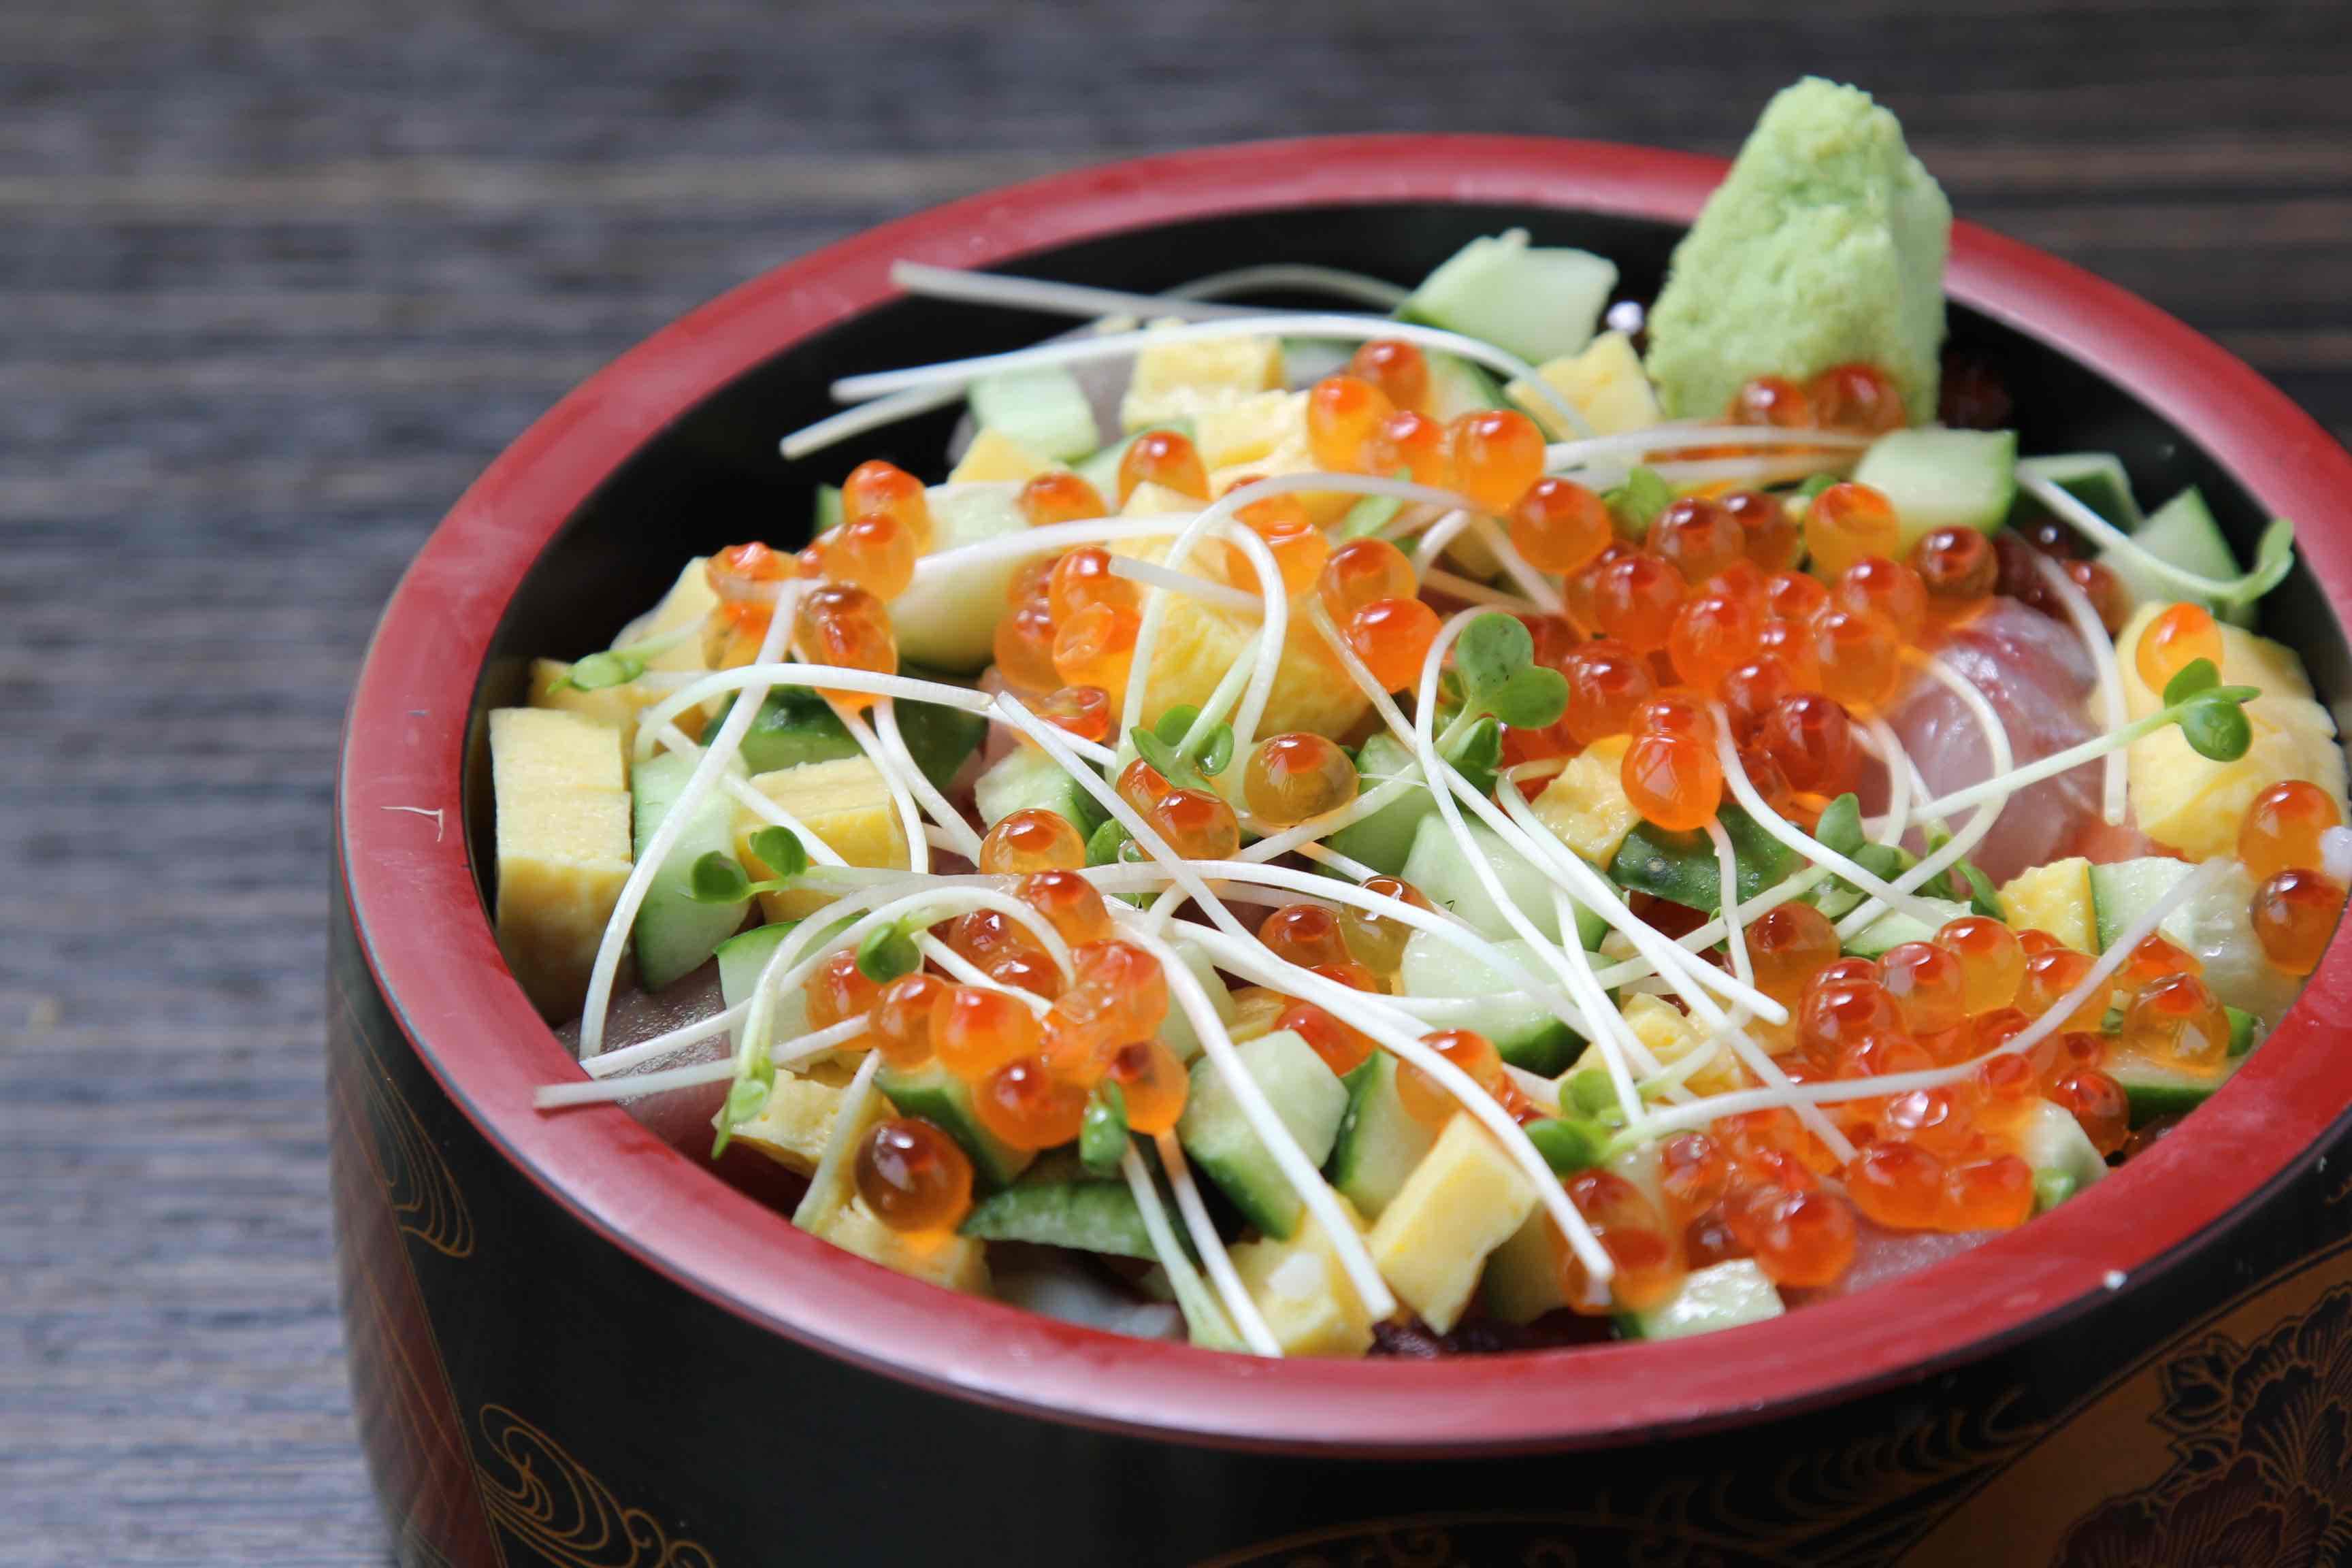 1630249686 556 otlichija sushi v japonii i drugih stranah chast 1 - ОТЛИЧИЯ СУШИ В ЯПОНИИ И ДРУГИХ СТРАНАХ   ЧАСТЬ 1